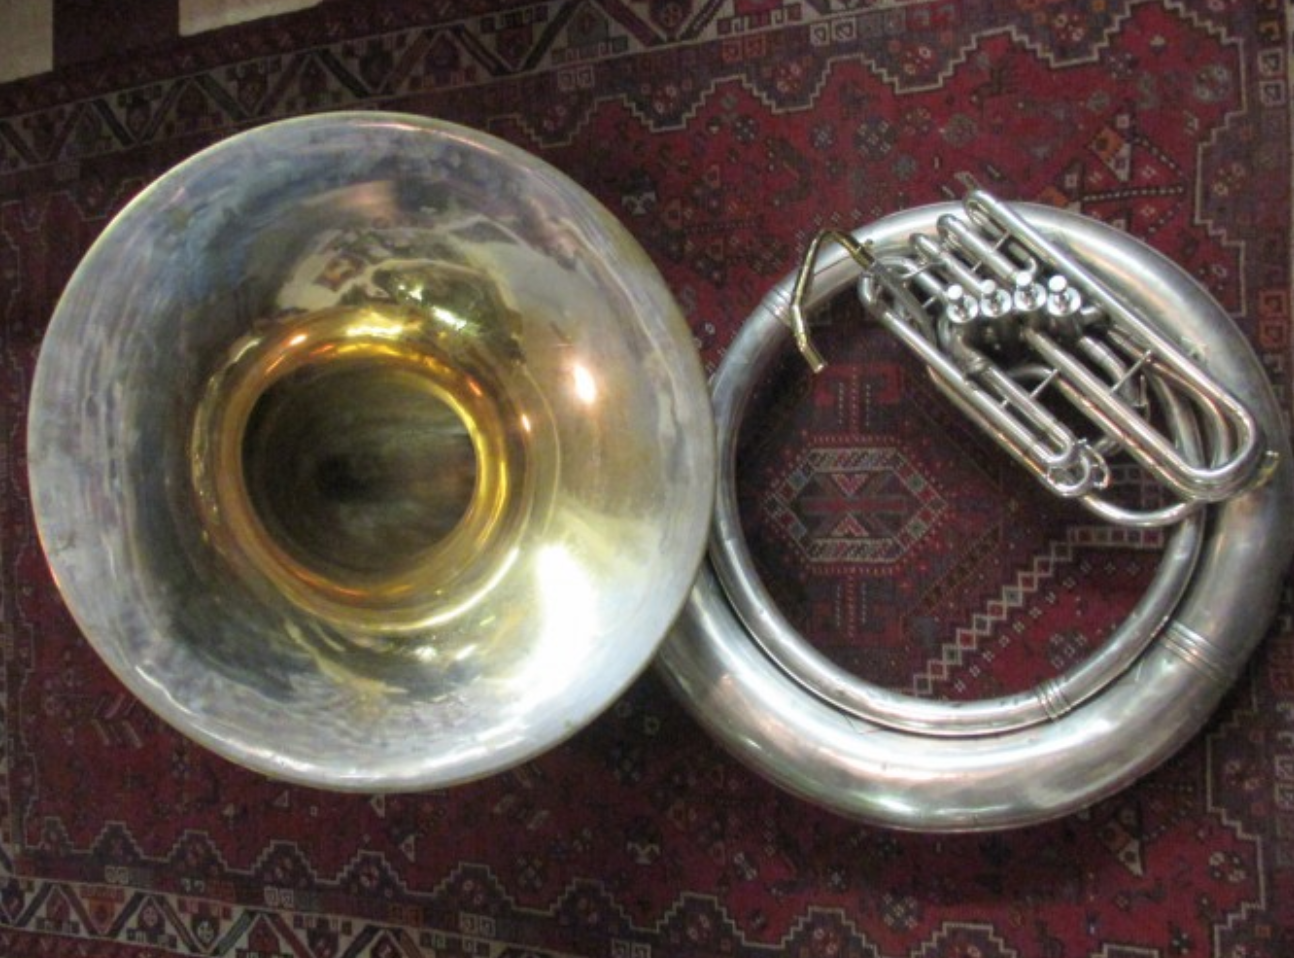 1931 King Giant BBb Sousaphone